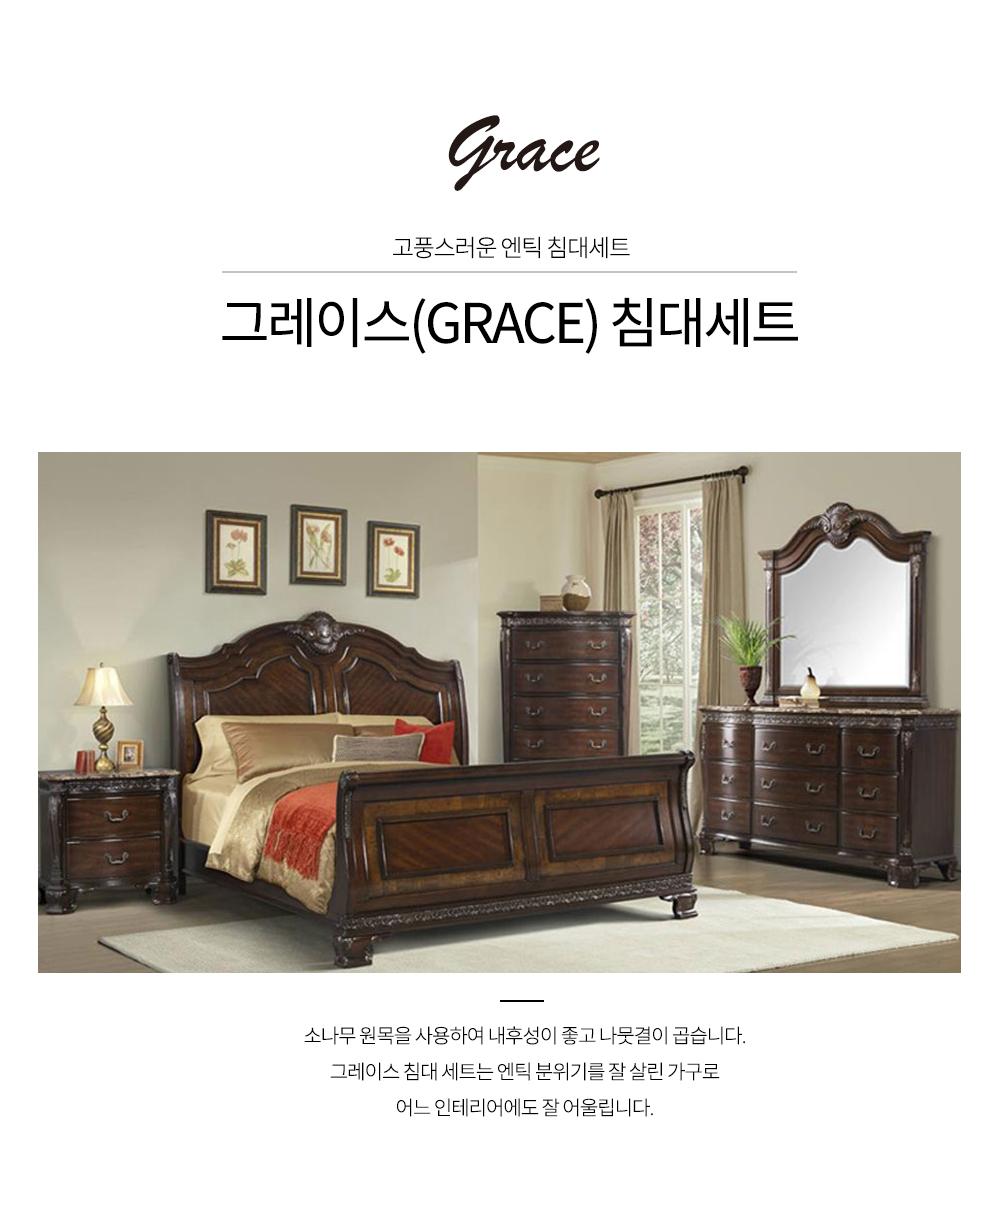 grace01.jpg